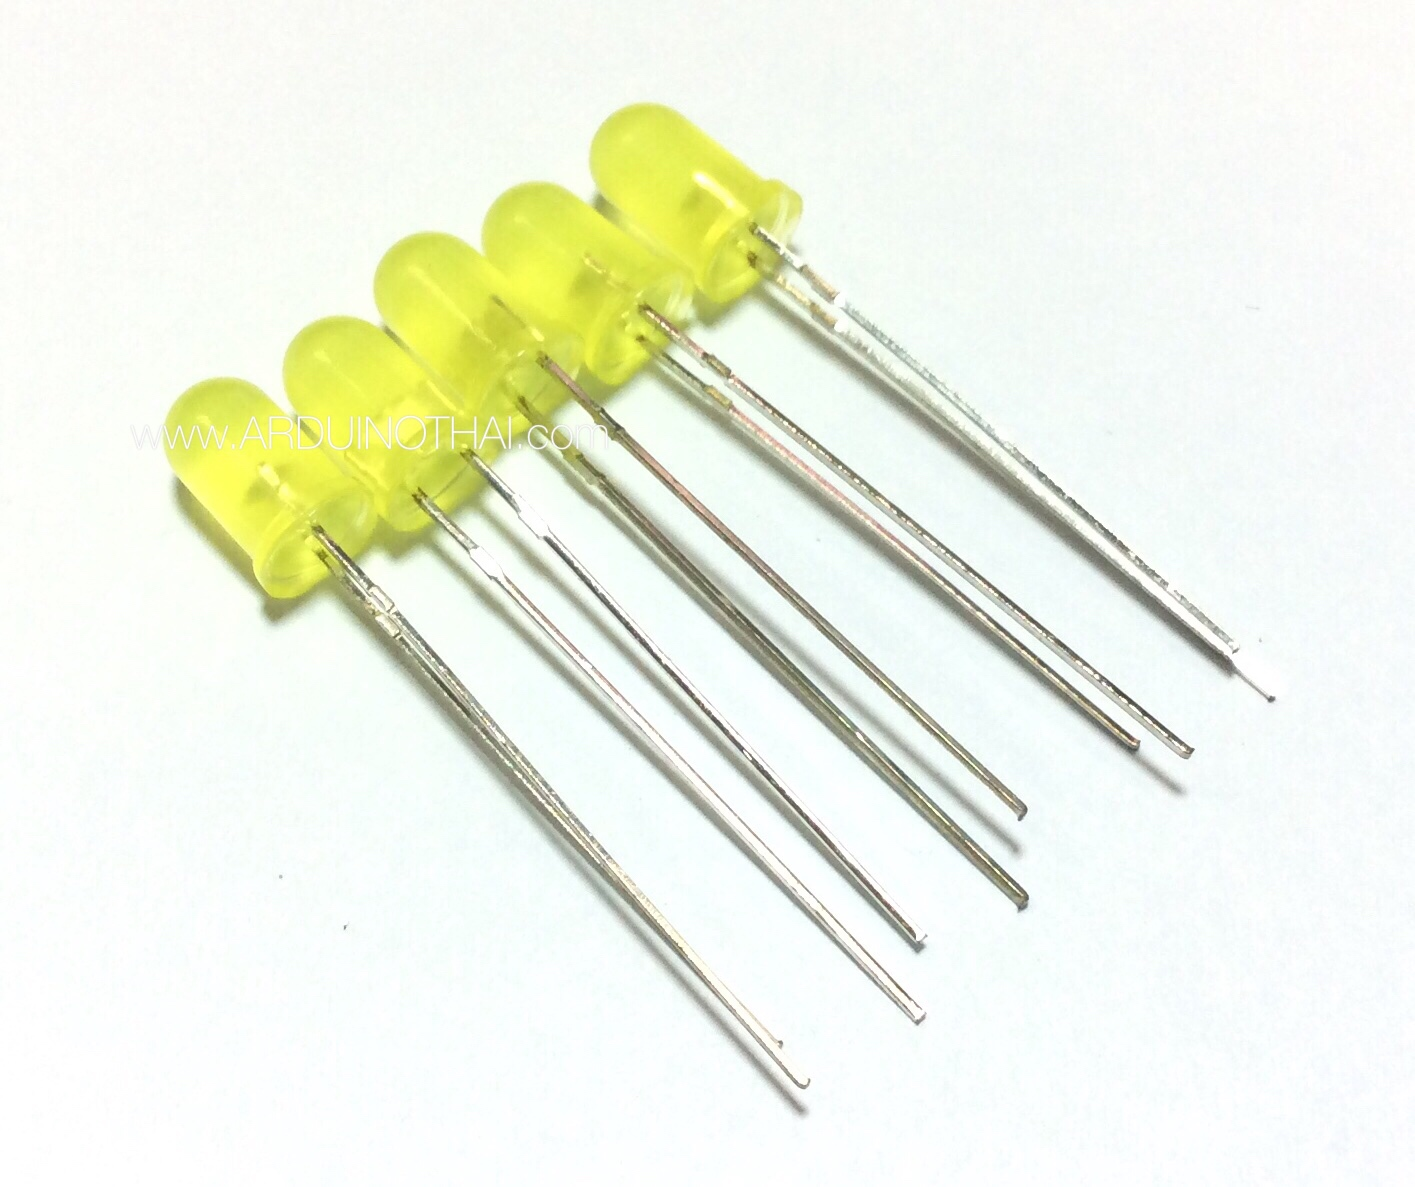 5mm LED Yellow (เปลี่ยนเป็นสีส้ม จำนวน 5 ดวง)